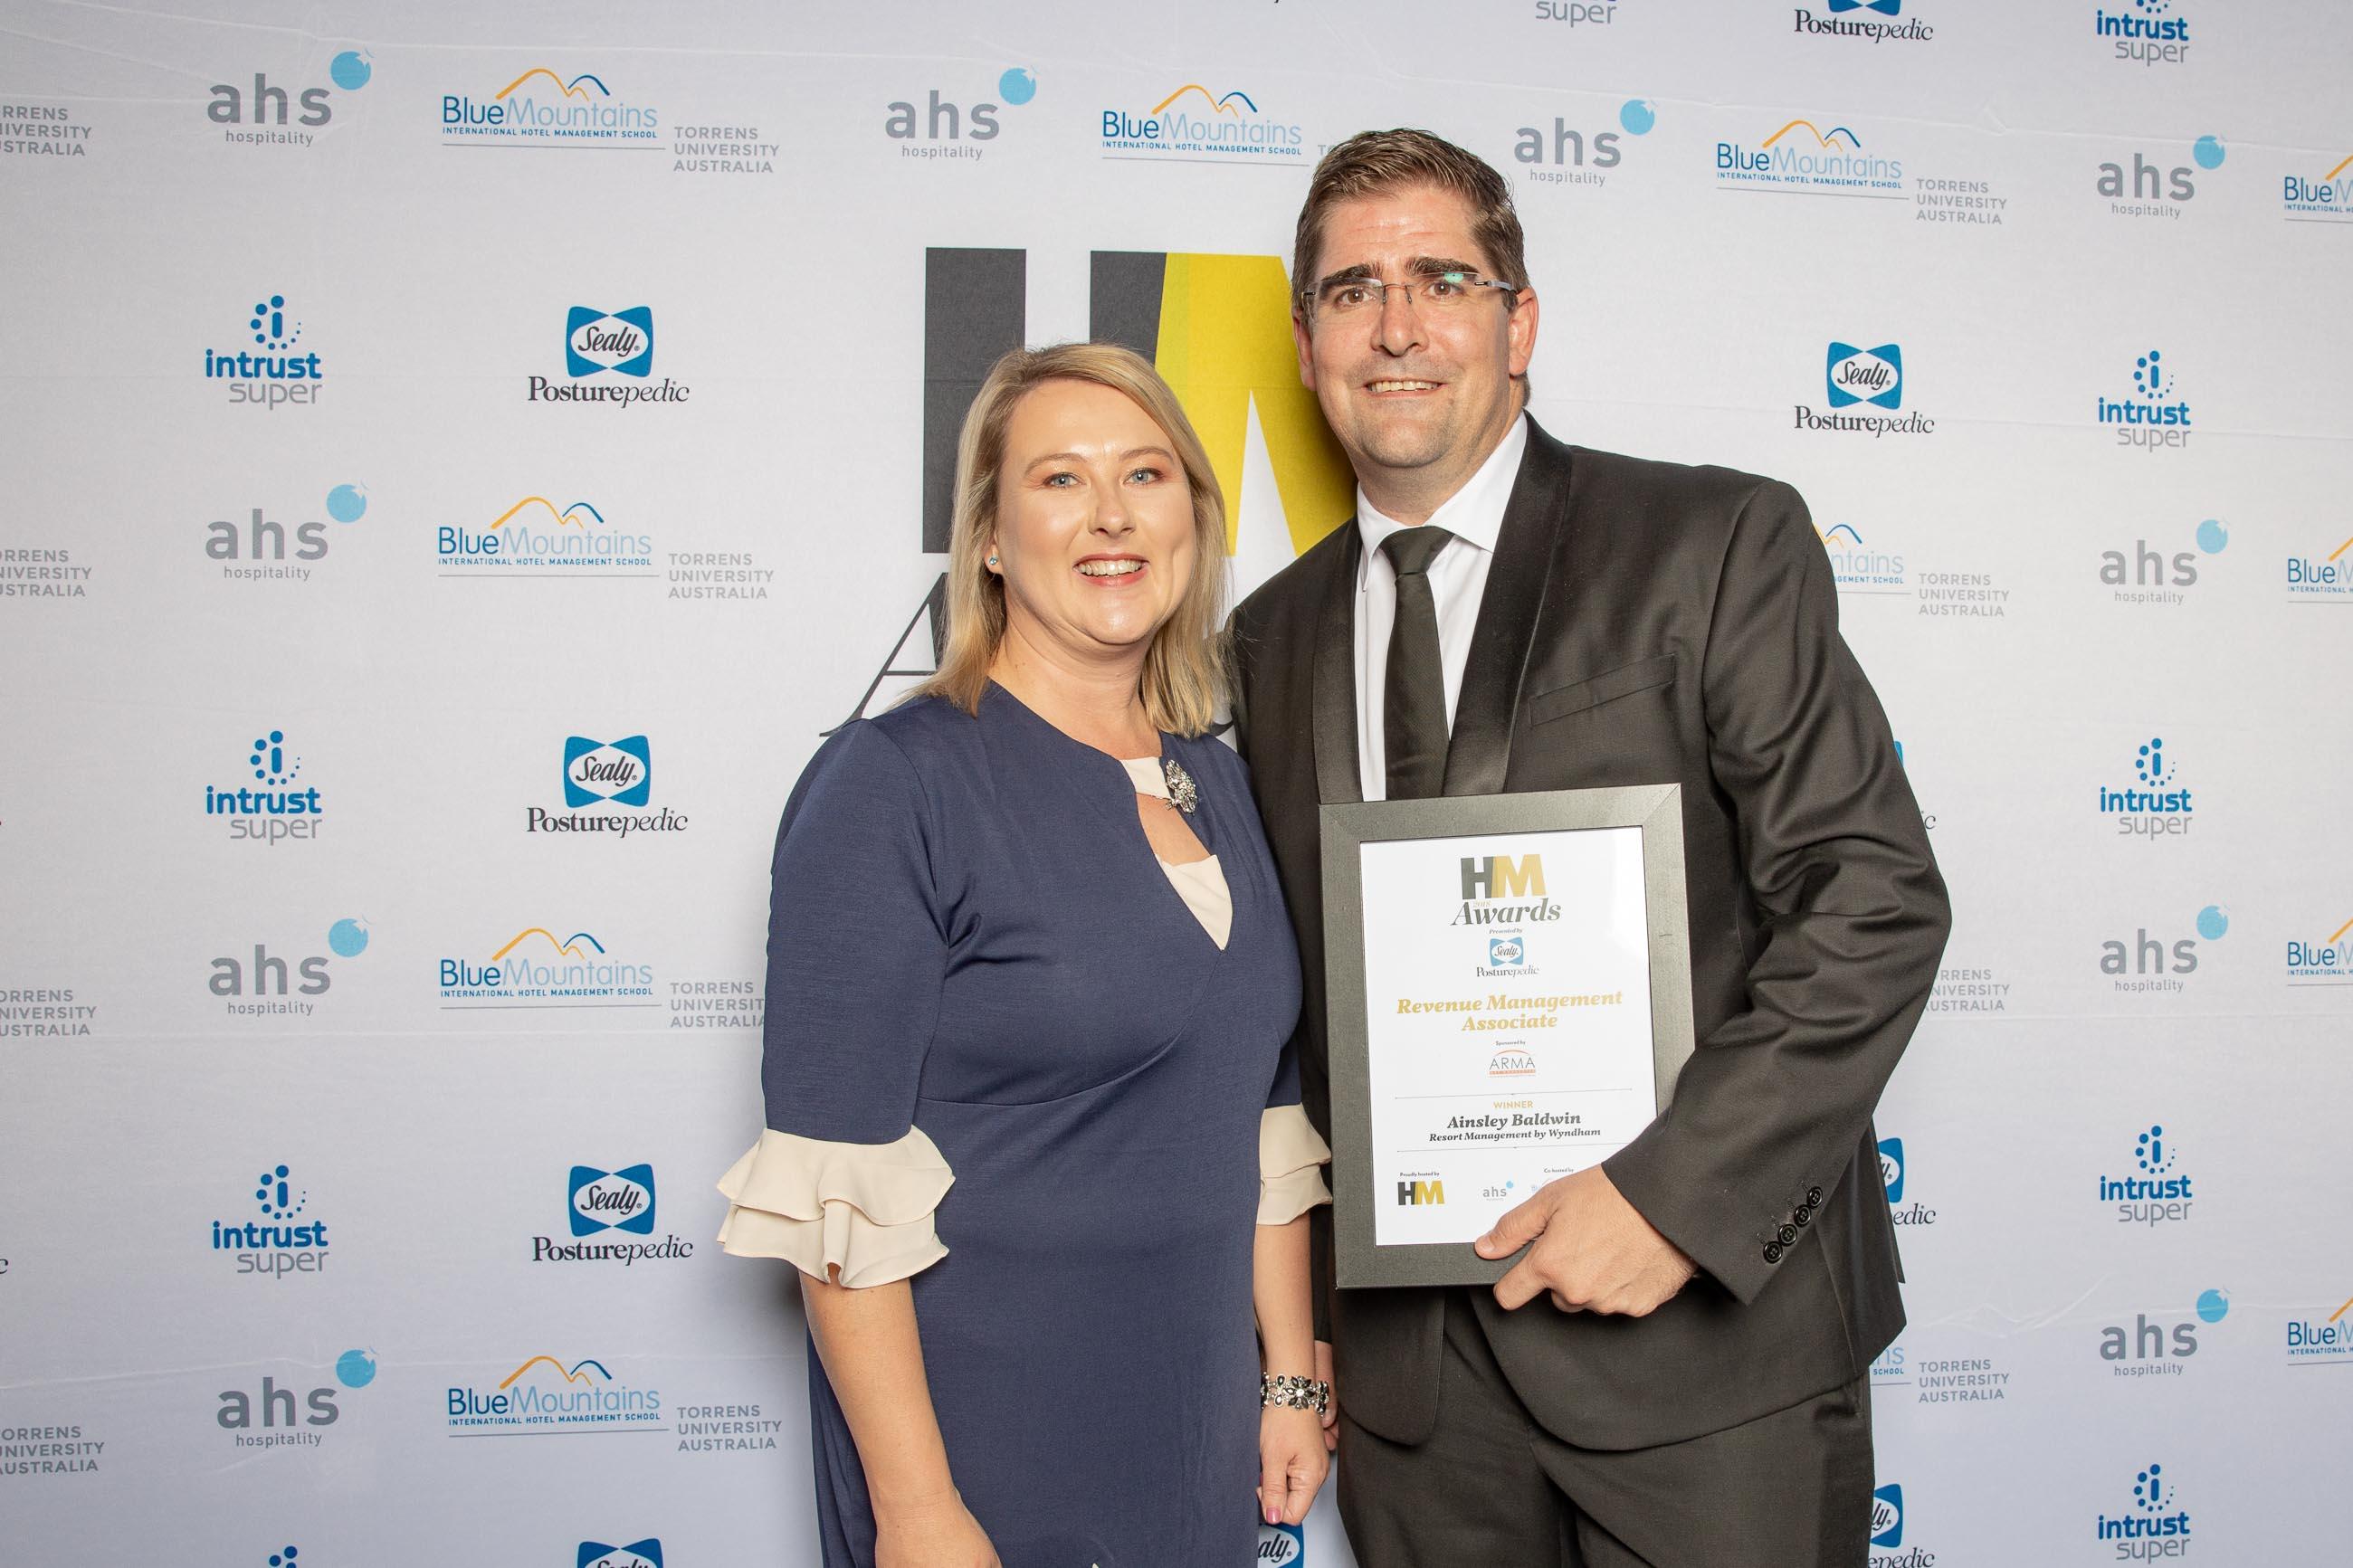 72ppi-HMawards-2018-official-award-wall-216216